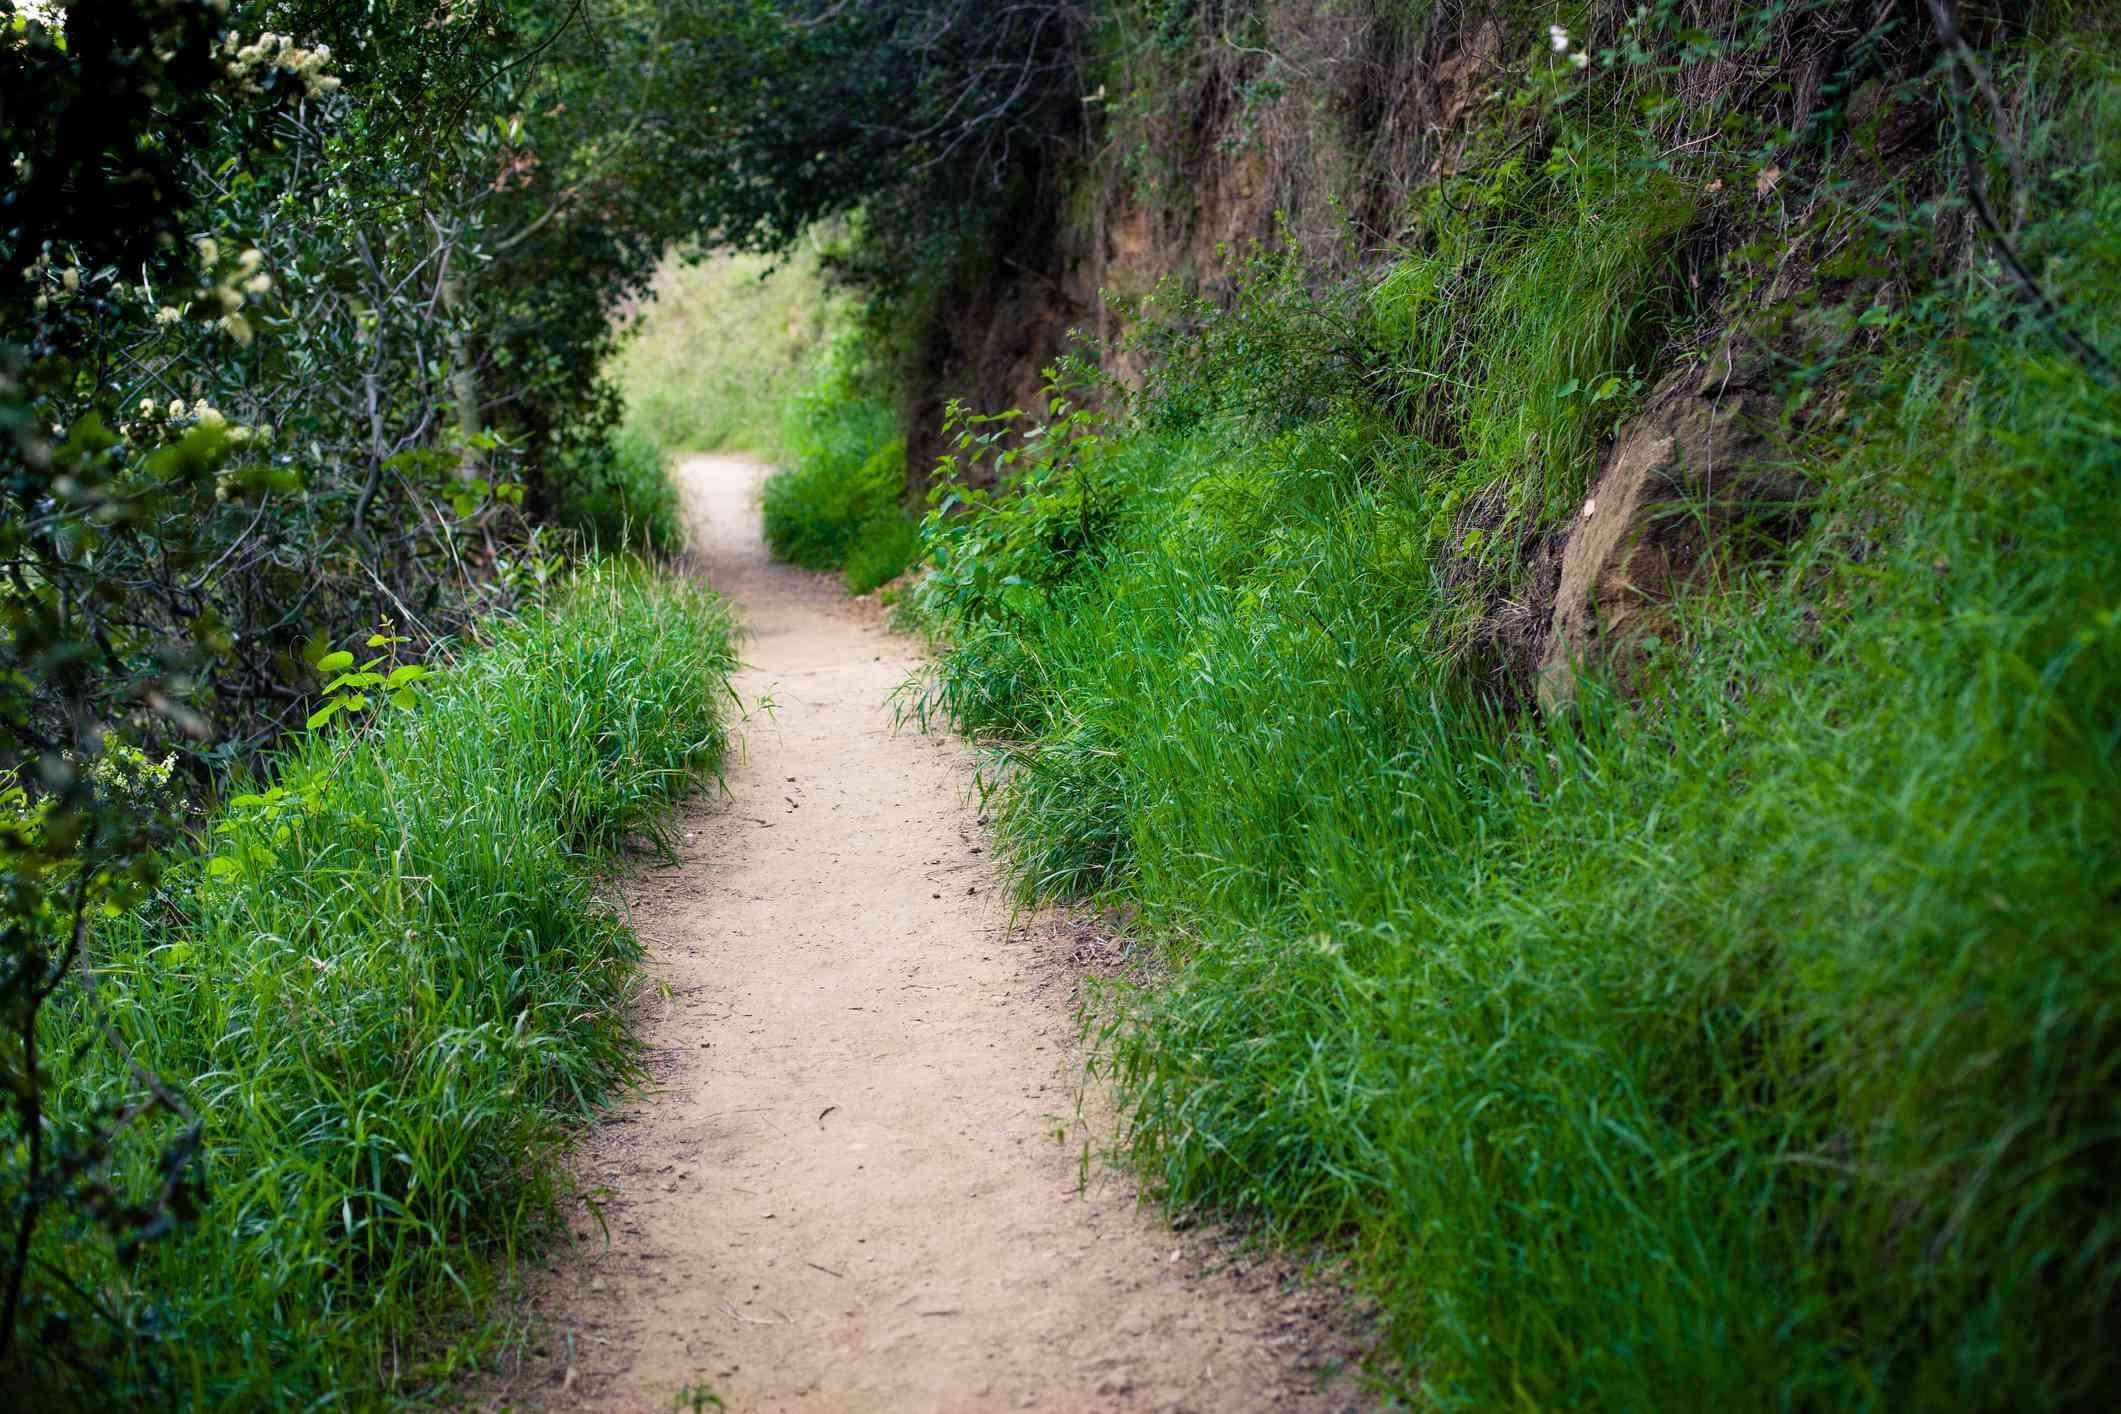 Hiking Trail Temescal Canyon, Santa Monica Mountains